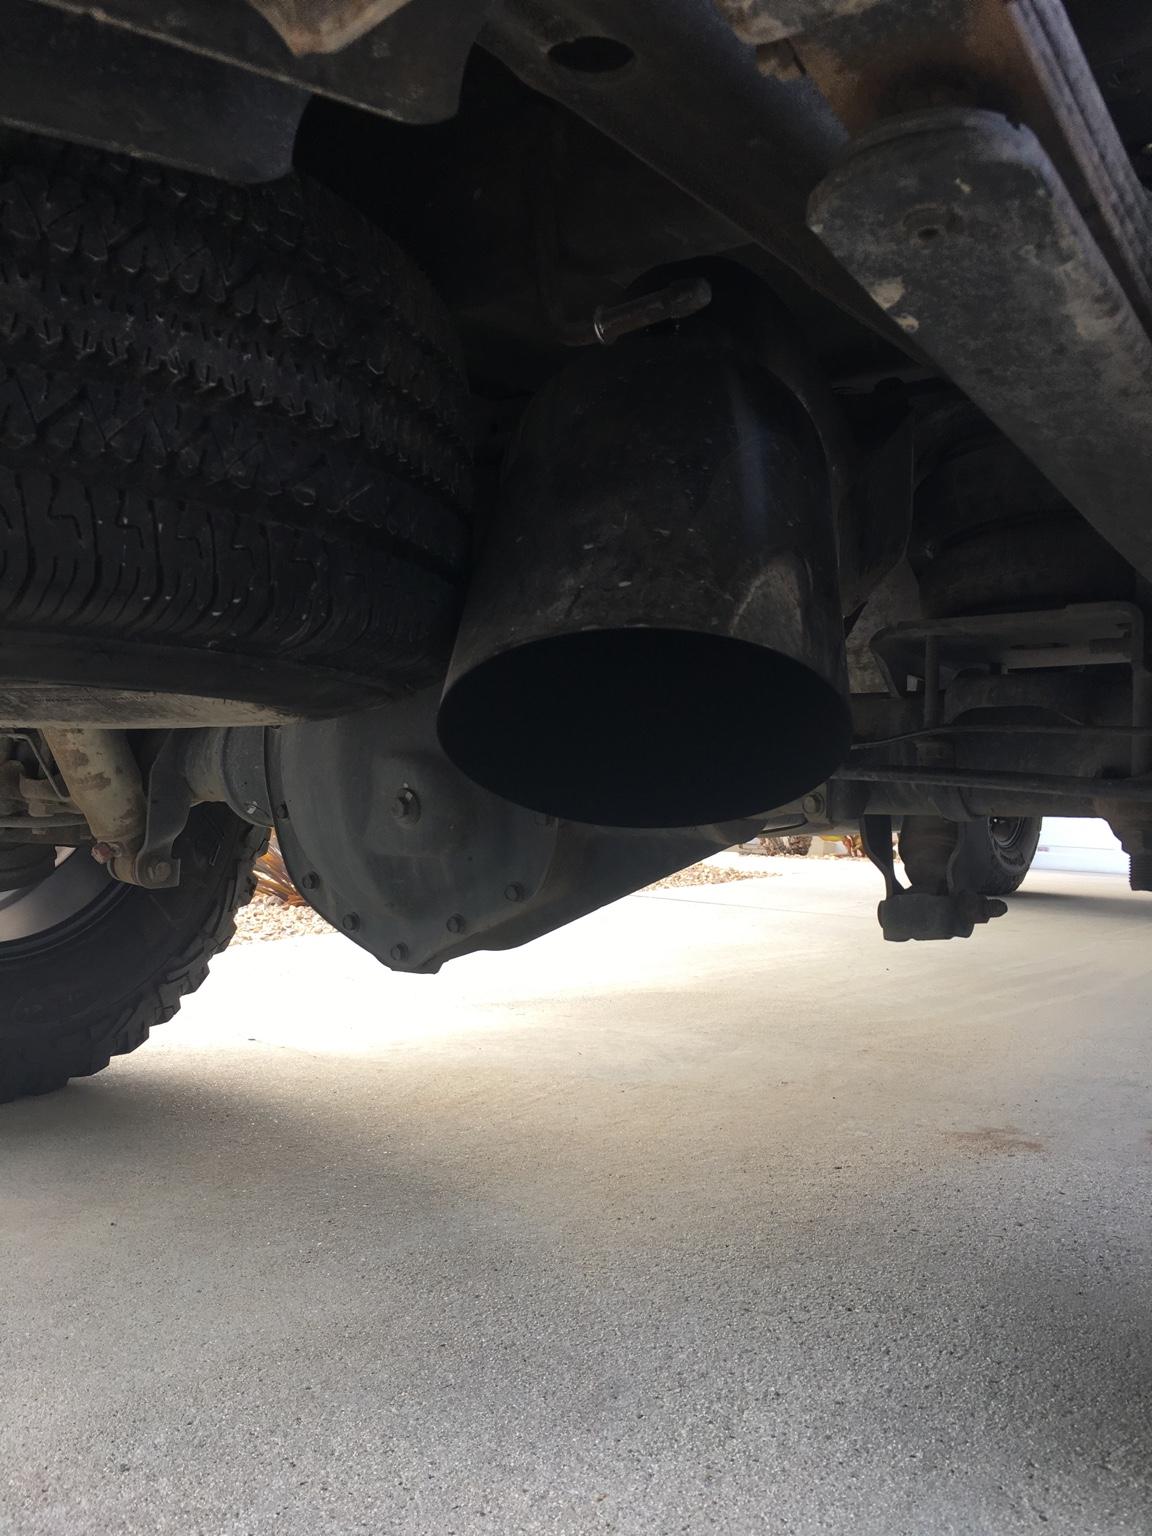 2016 Gmc Sierra 2500Hd Crew Cab >> 8 inch tip, over axle dump, stock spare tire - Chevy and GMC Duramax Diesel Forum